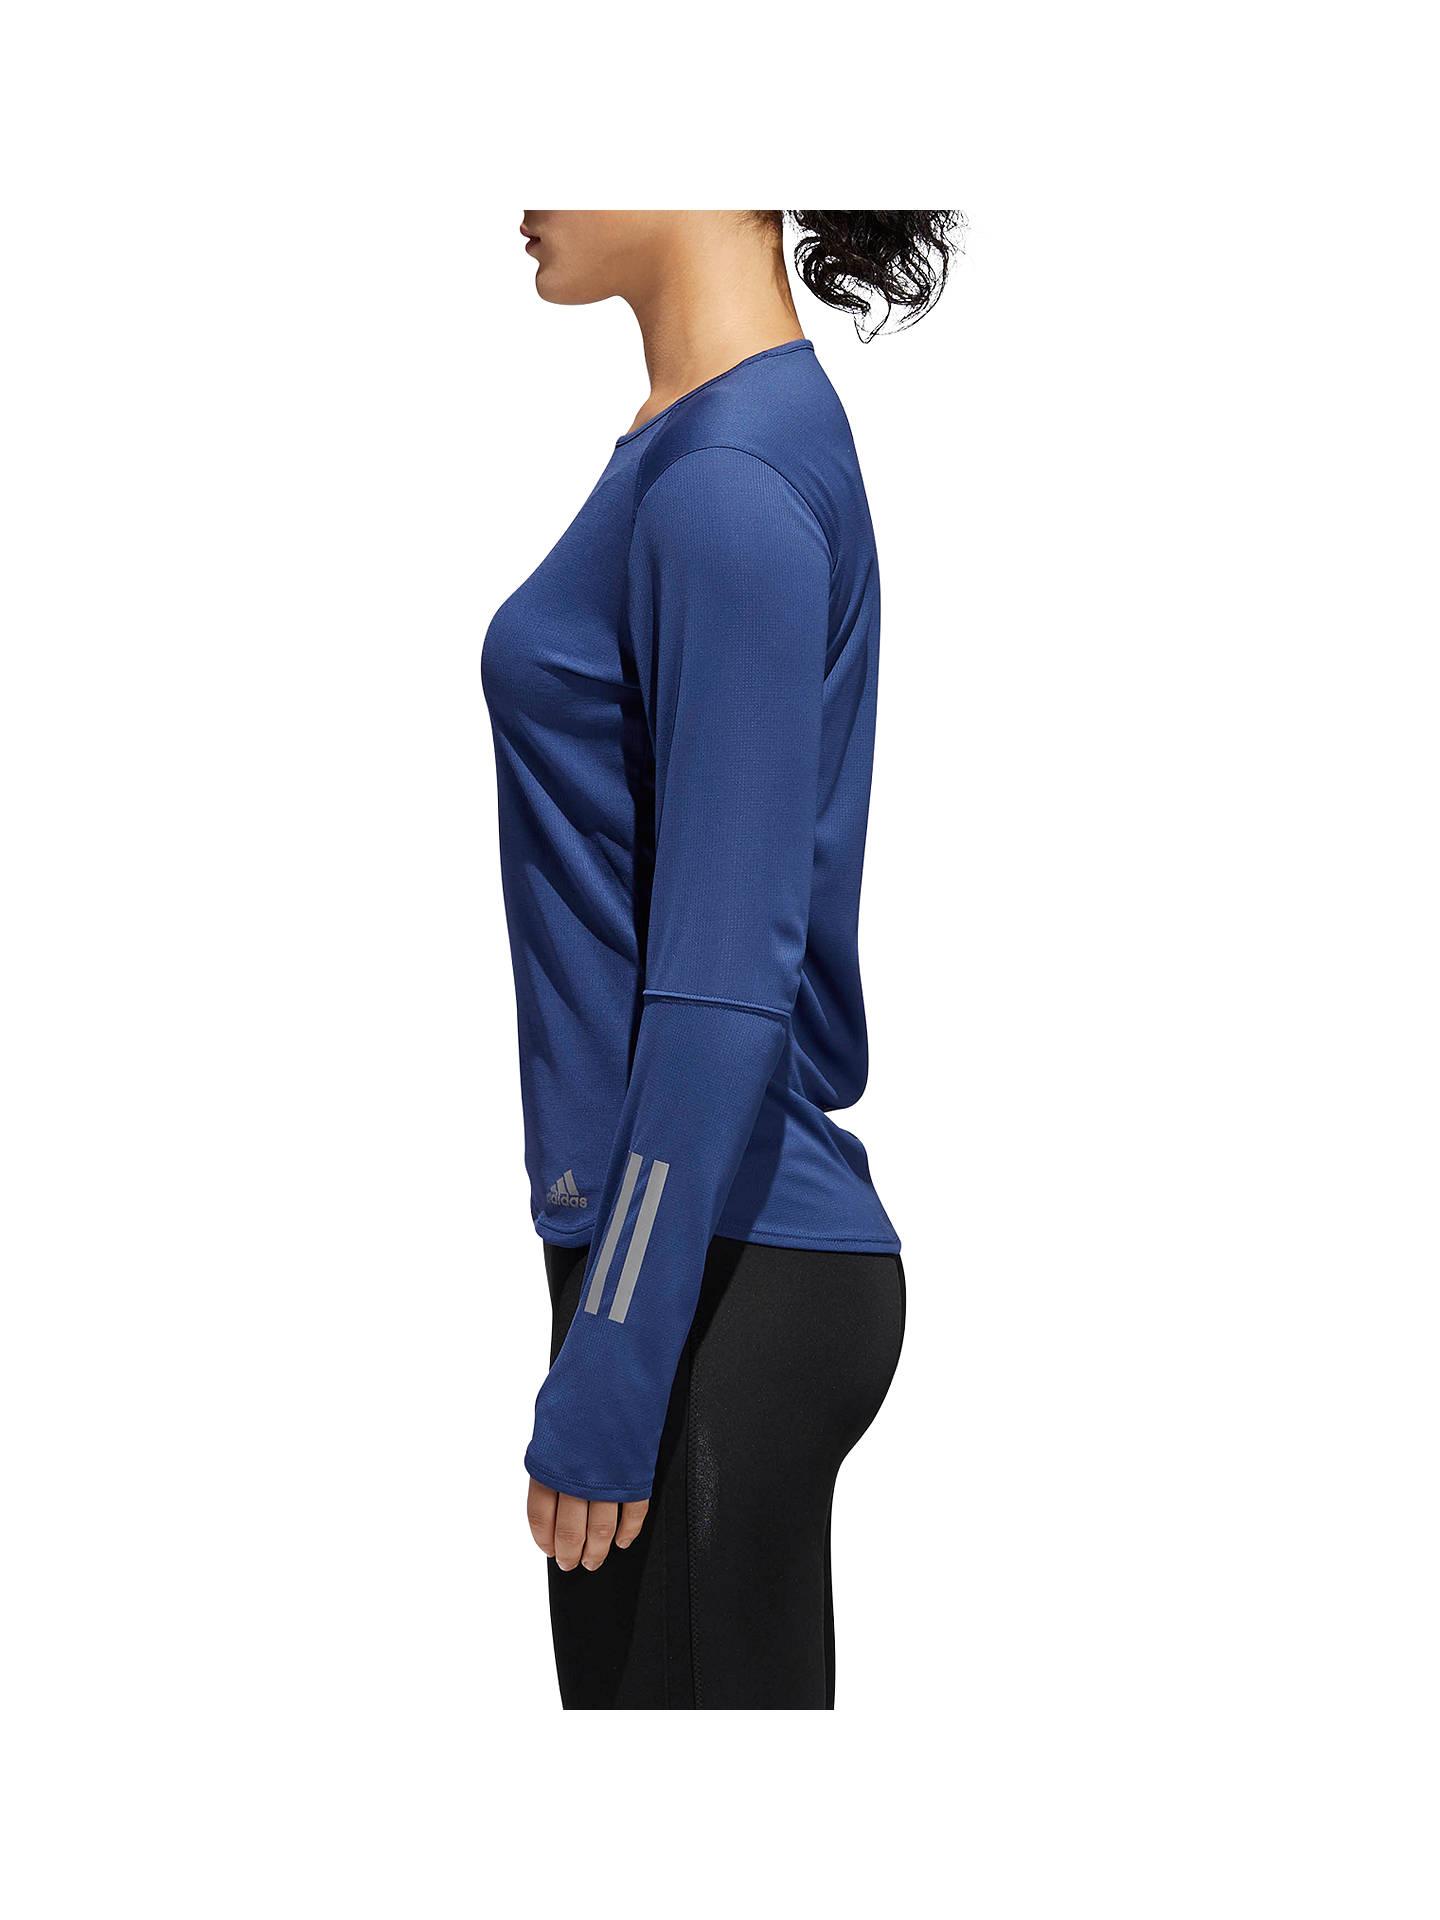 81527efab45 ... Buy adidas Response Reflective Long Sleeve Running T-Shirt, Noble Indigo,  XS Online ...